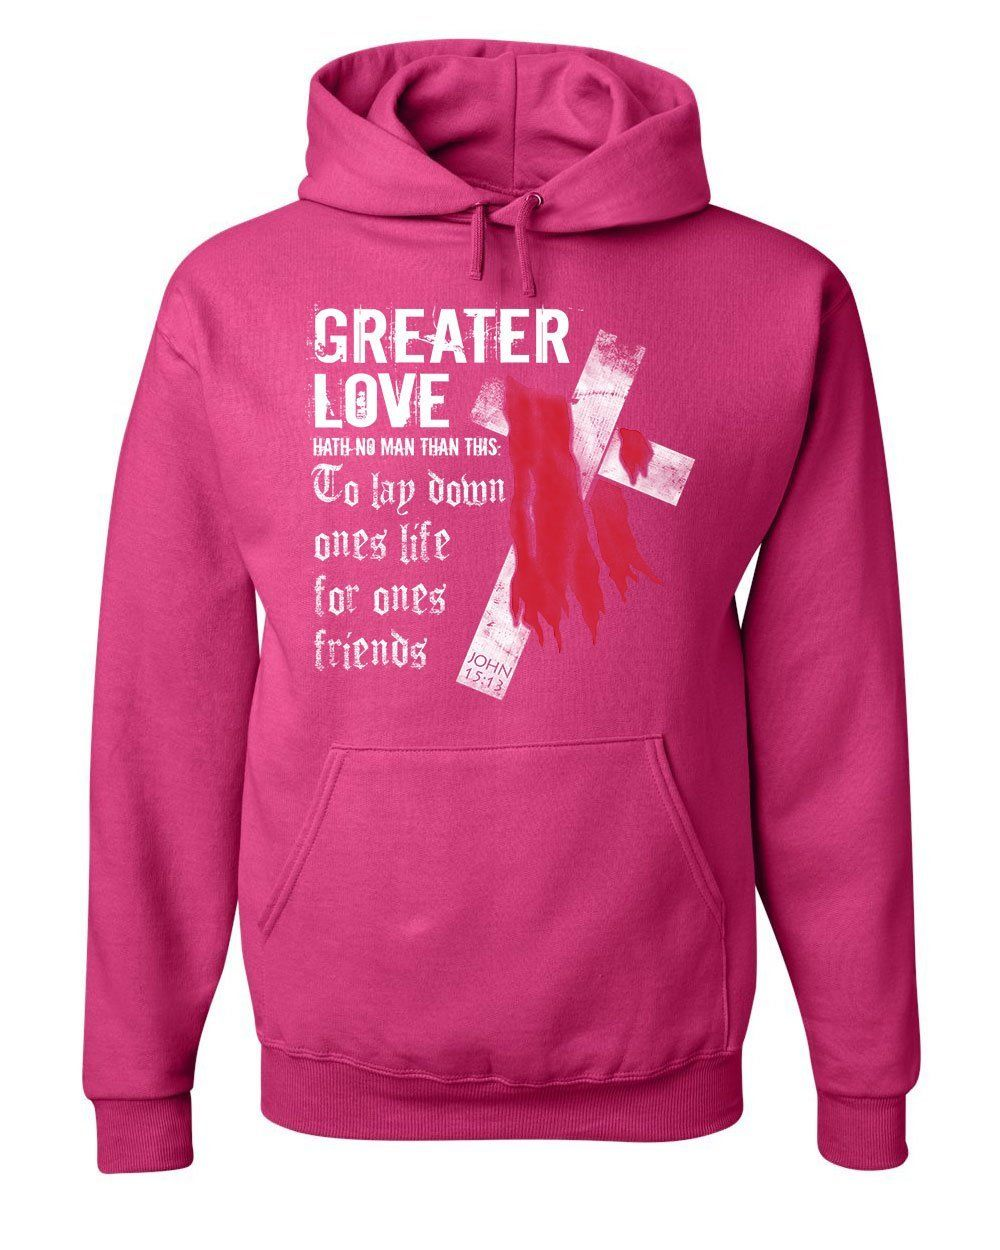 e8ea1fcd7 Greater Love Hoodie Jesus Christ Cross Bible Religion God Lord Sweatshirt